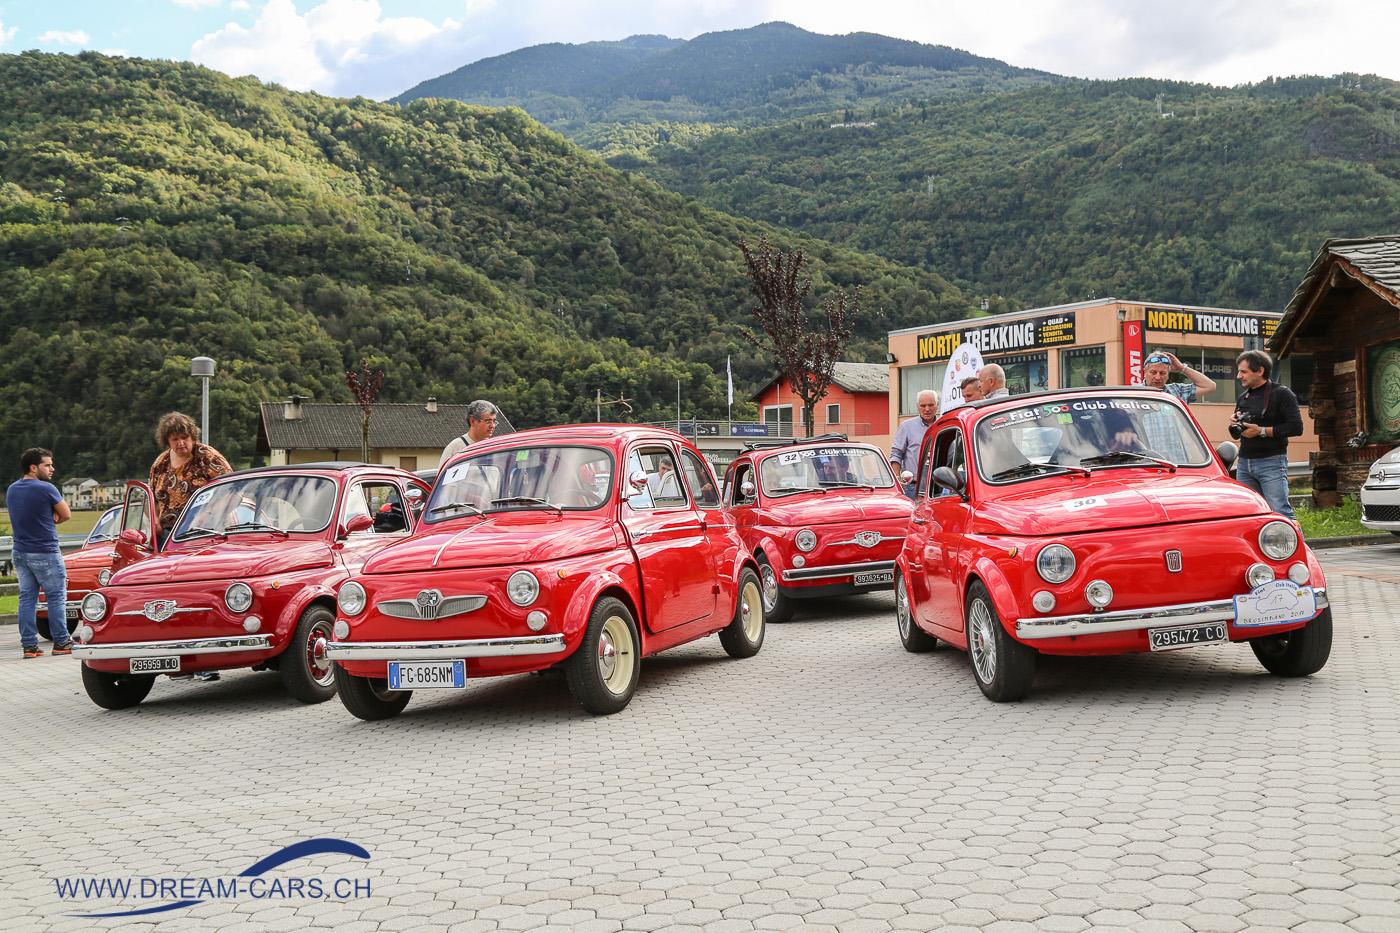 Fiat 500 Treffen, Chiuro, Italien, 24. September 2017. Das Cincent in Costa fand bereits zum 6. Mal statt